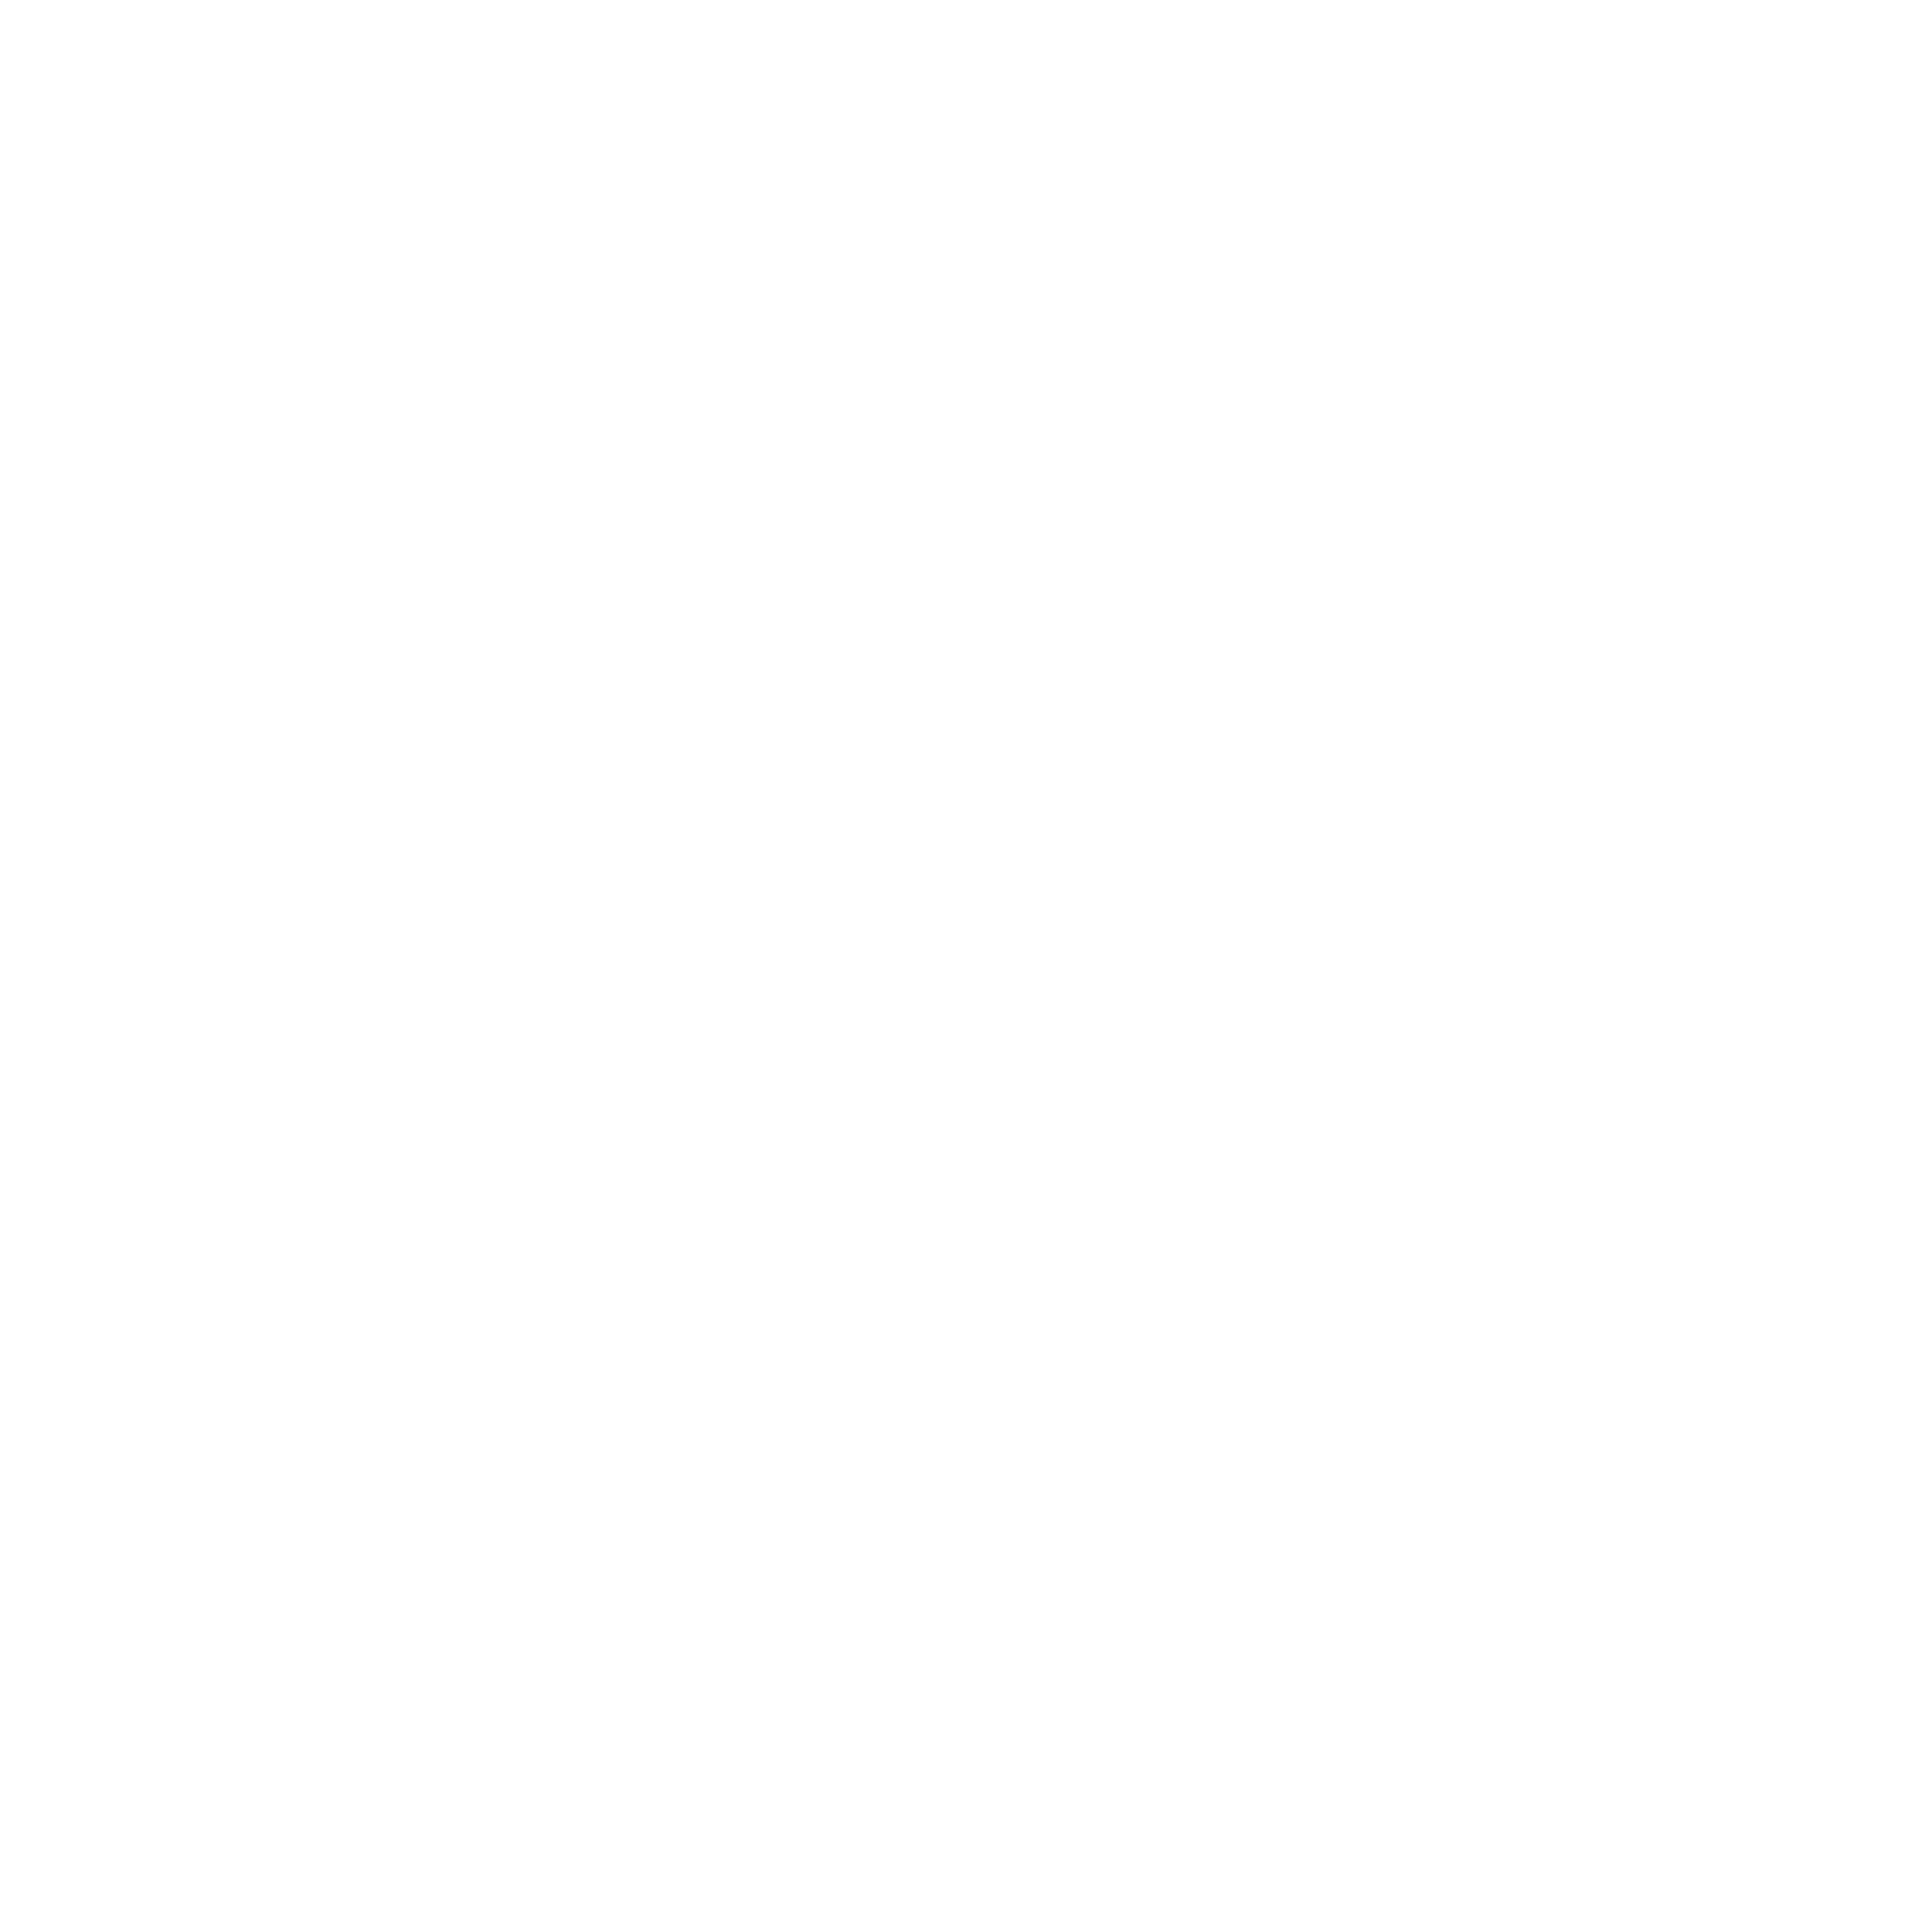 Icons8 - Сайт (32, белый)